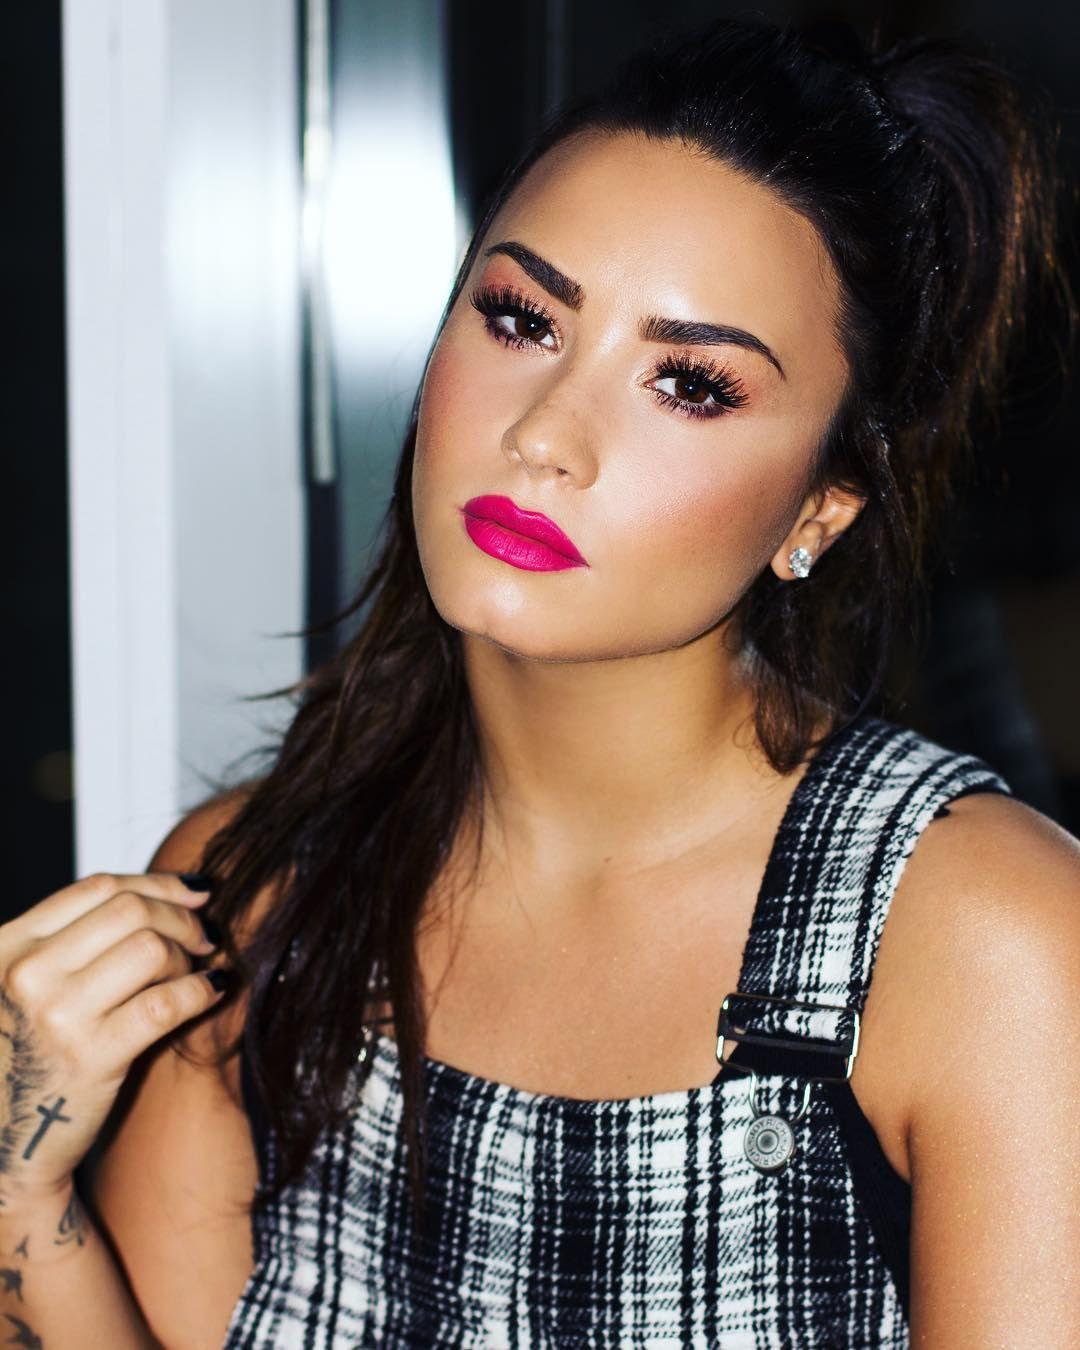 "900.7b Beğenme, 3,703 Yorum - Instagram'da Demi Lovato (@ddlovato): "": @angelokritikos"""